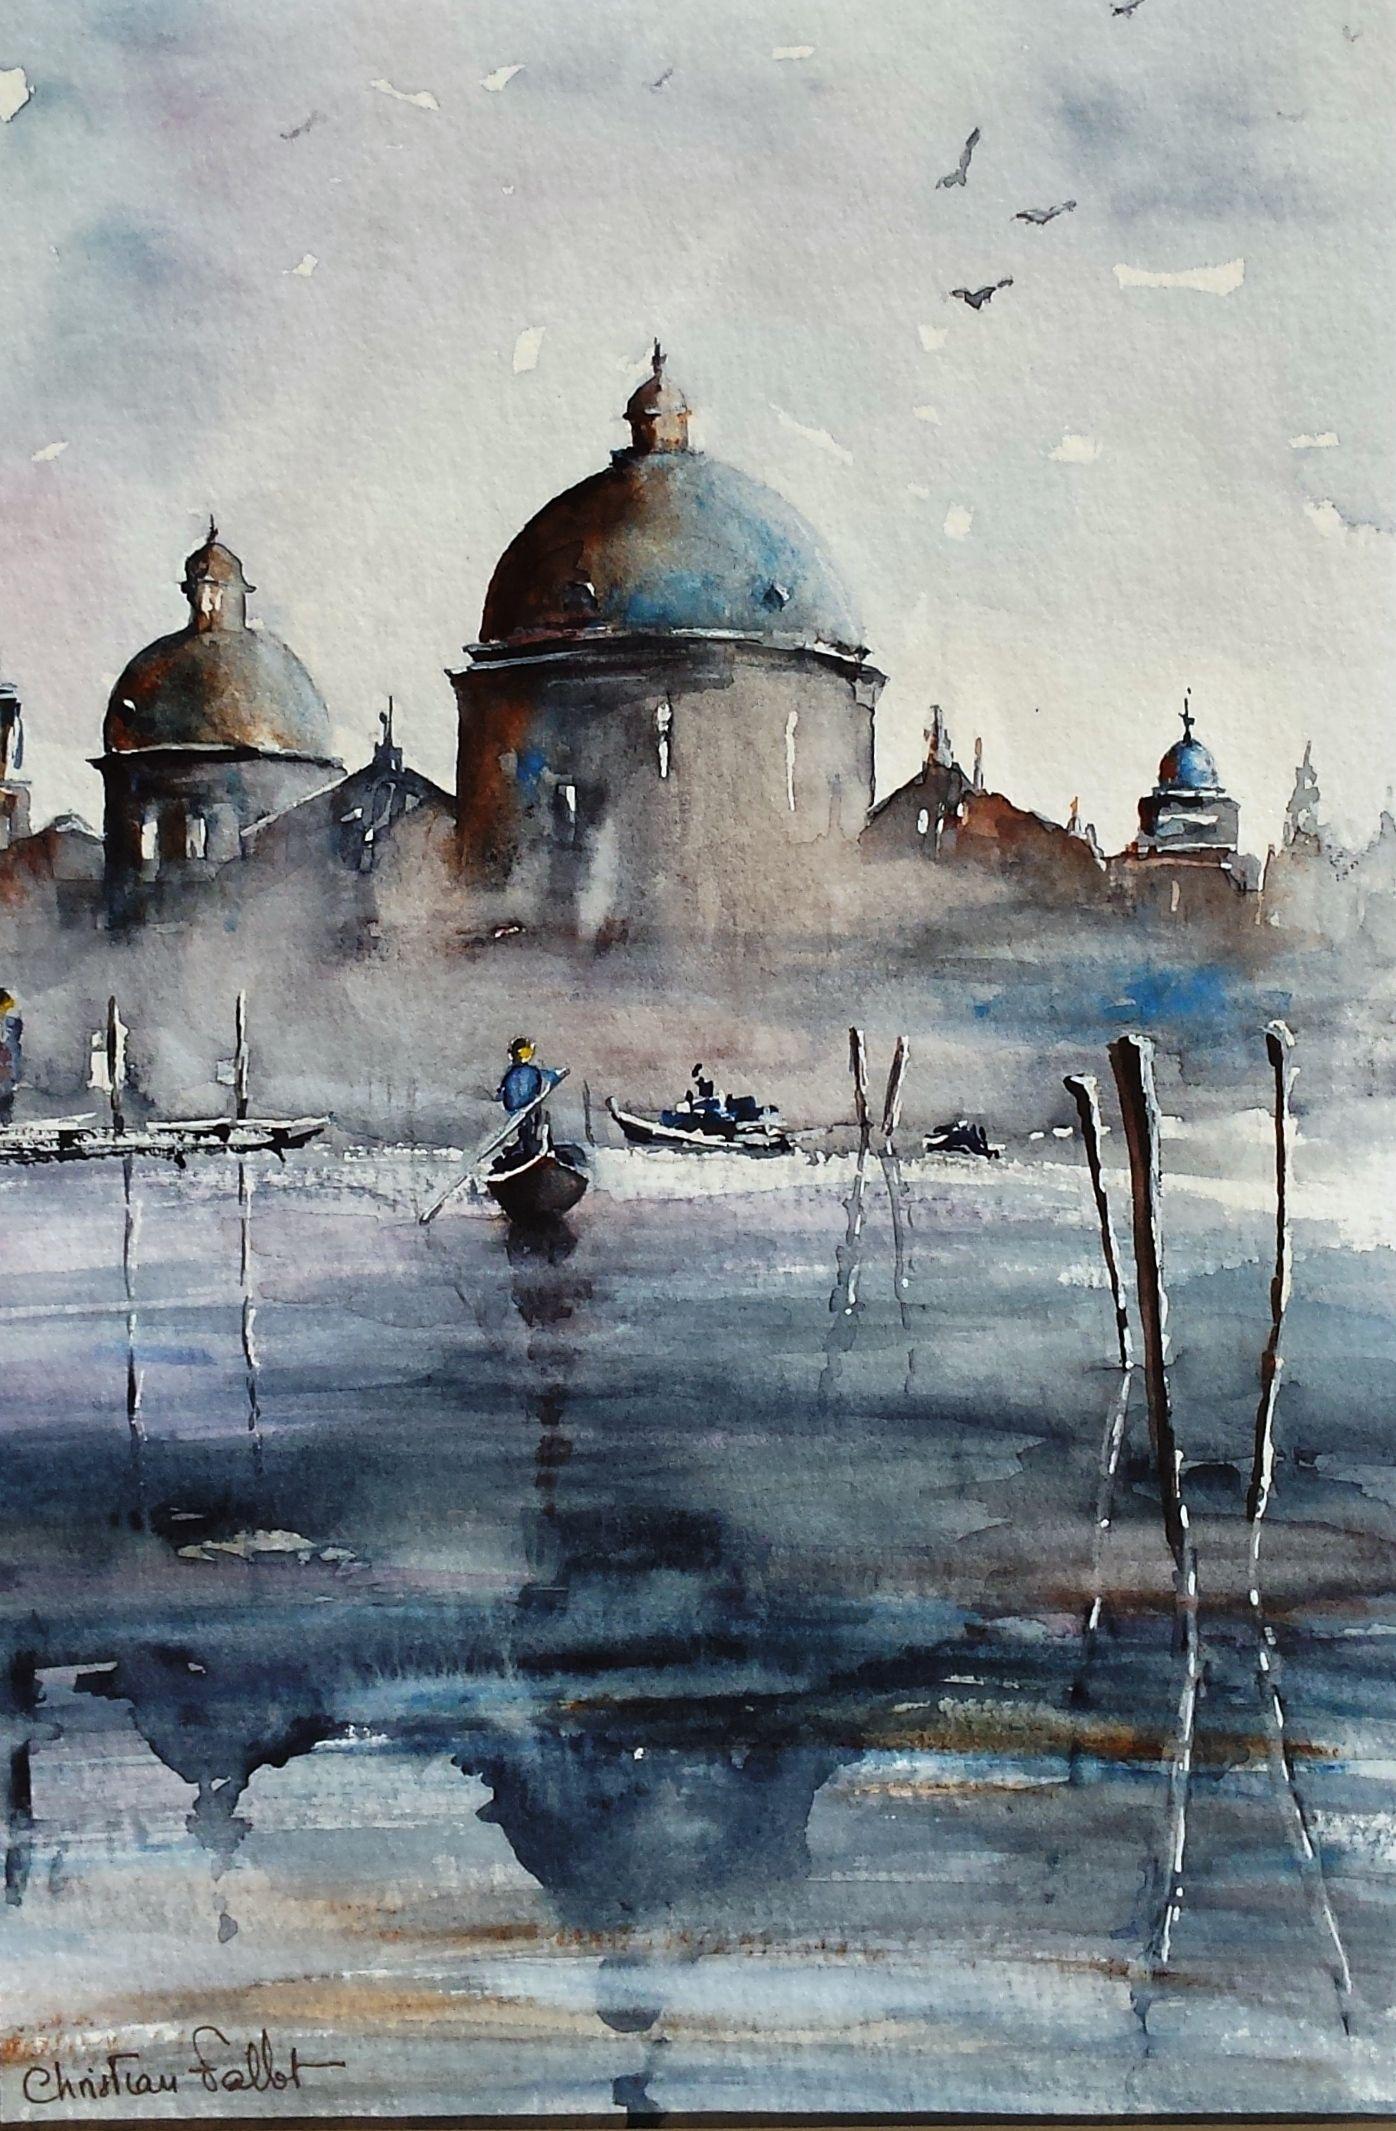 Christian Fallot Aquarelle Venise Le Grand Canal 1 Peinture